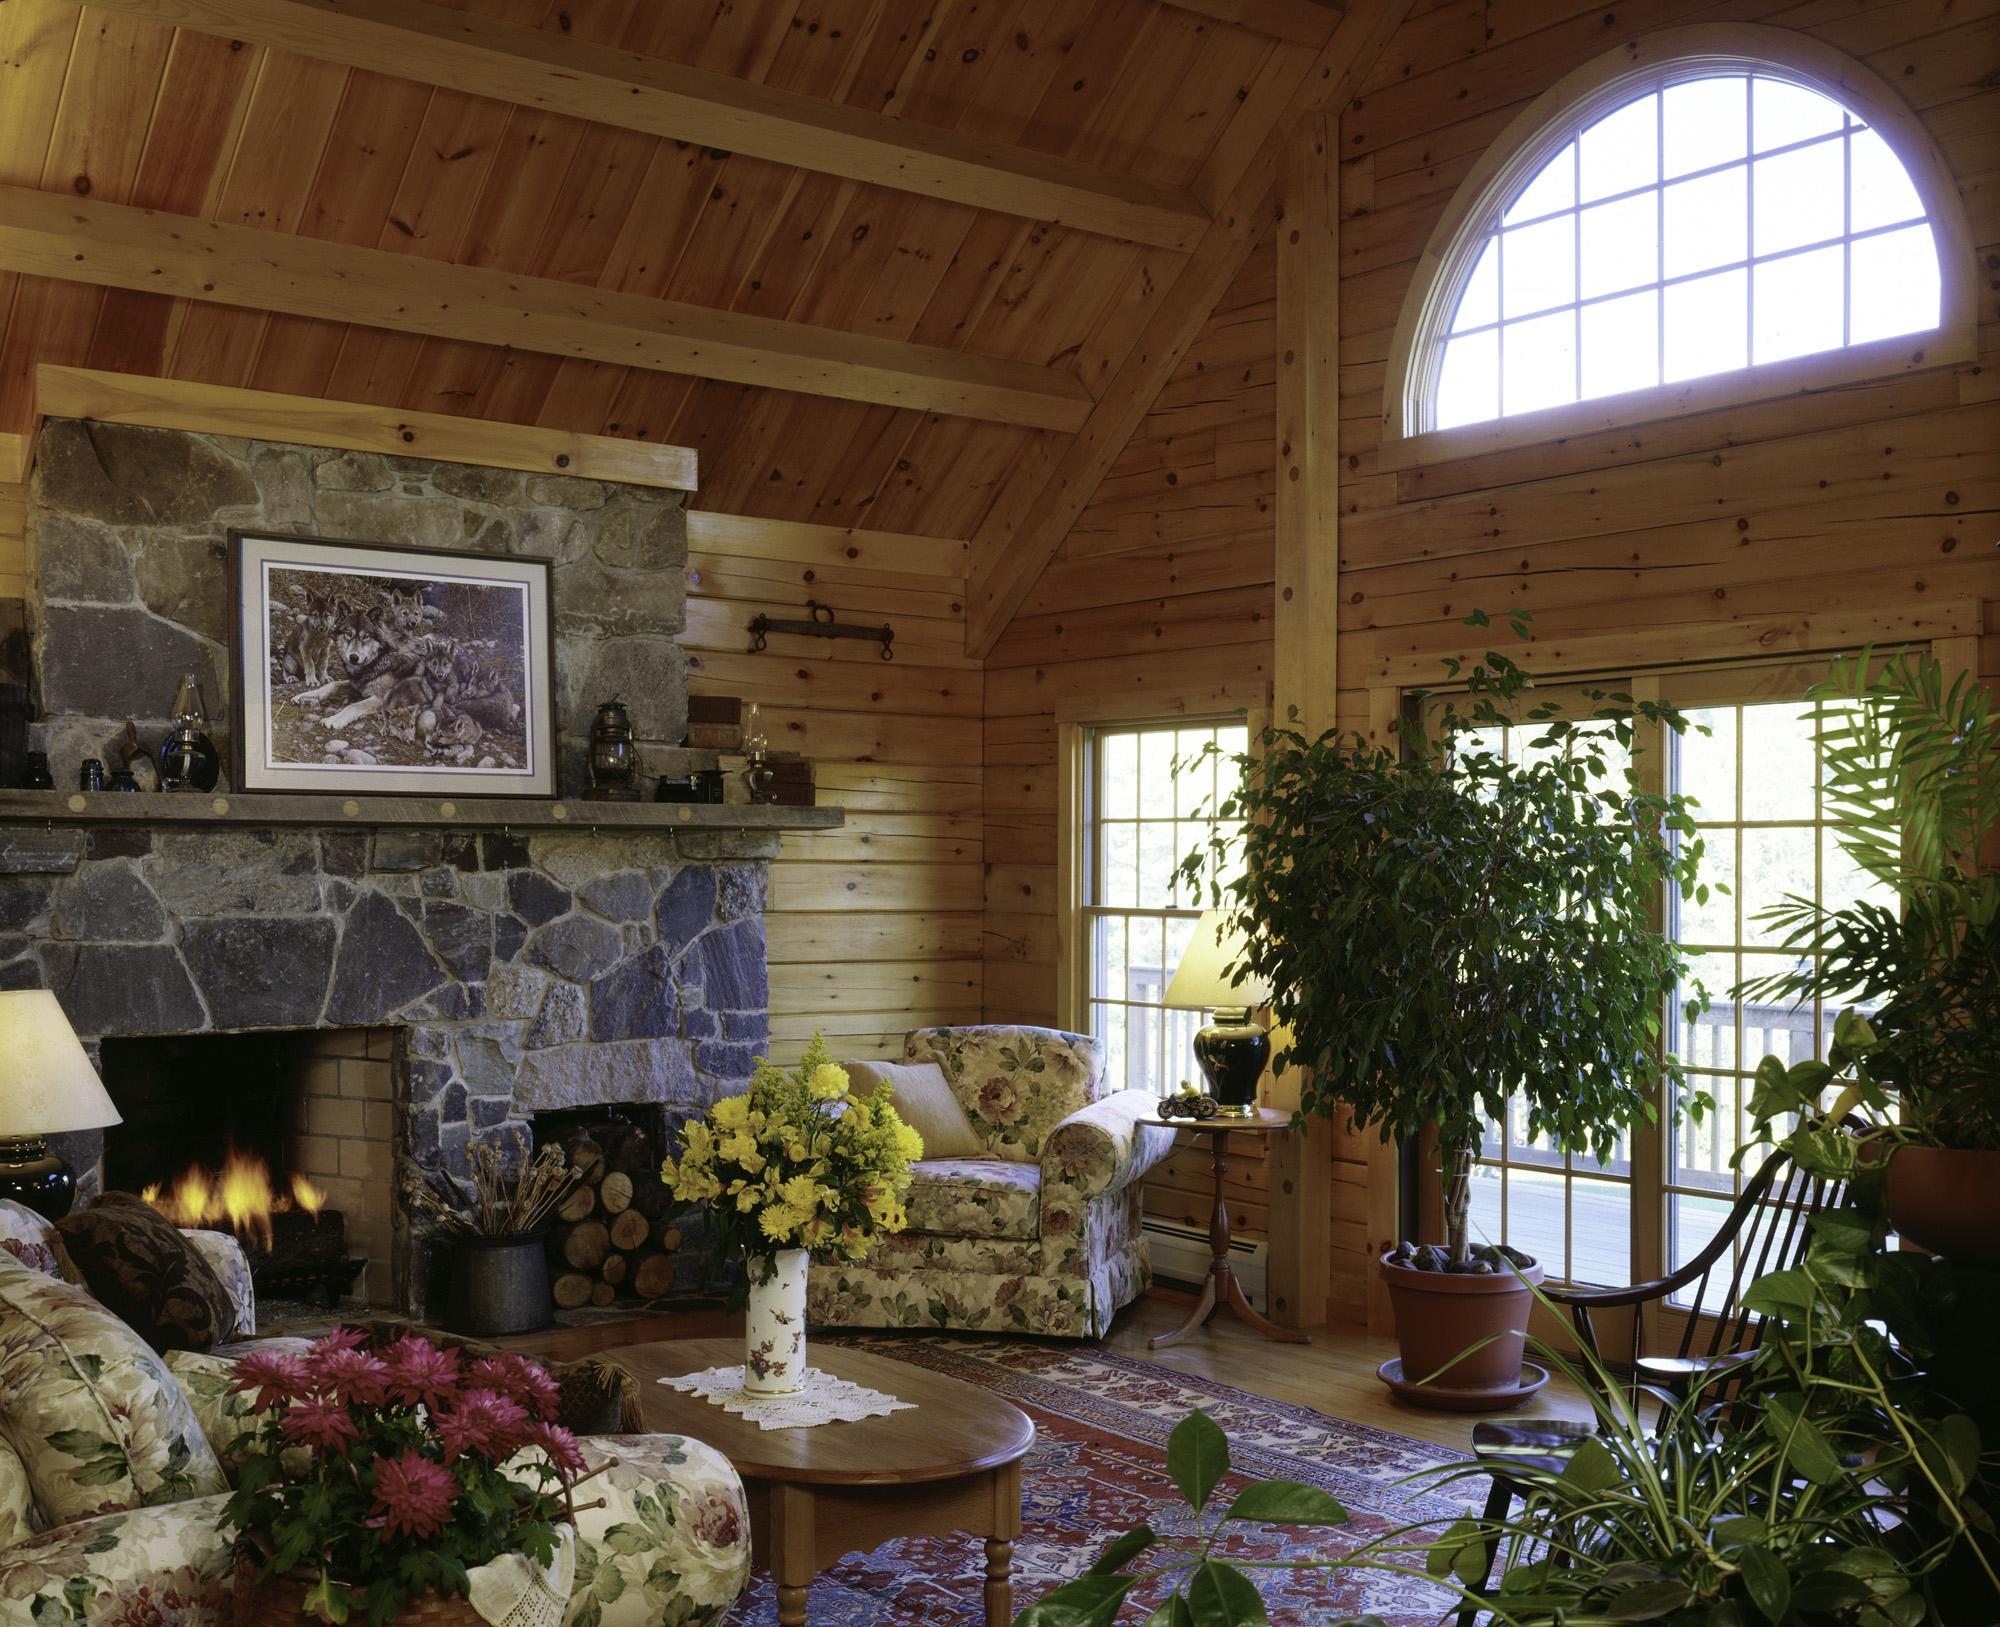 Kentuckean_Modified_Dilorenzo - Dilorenzo-Living-Room-small.jpg